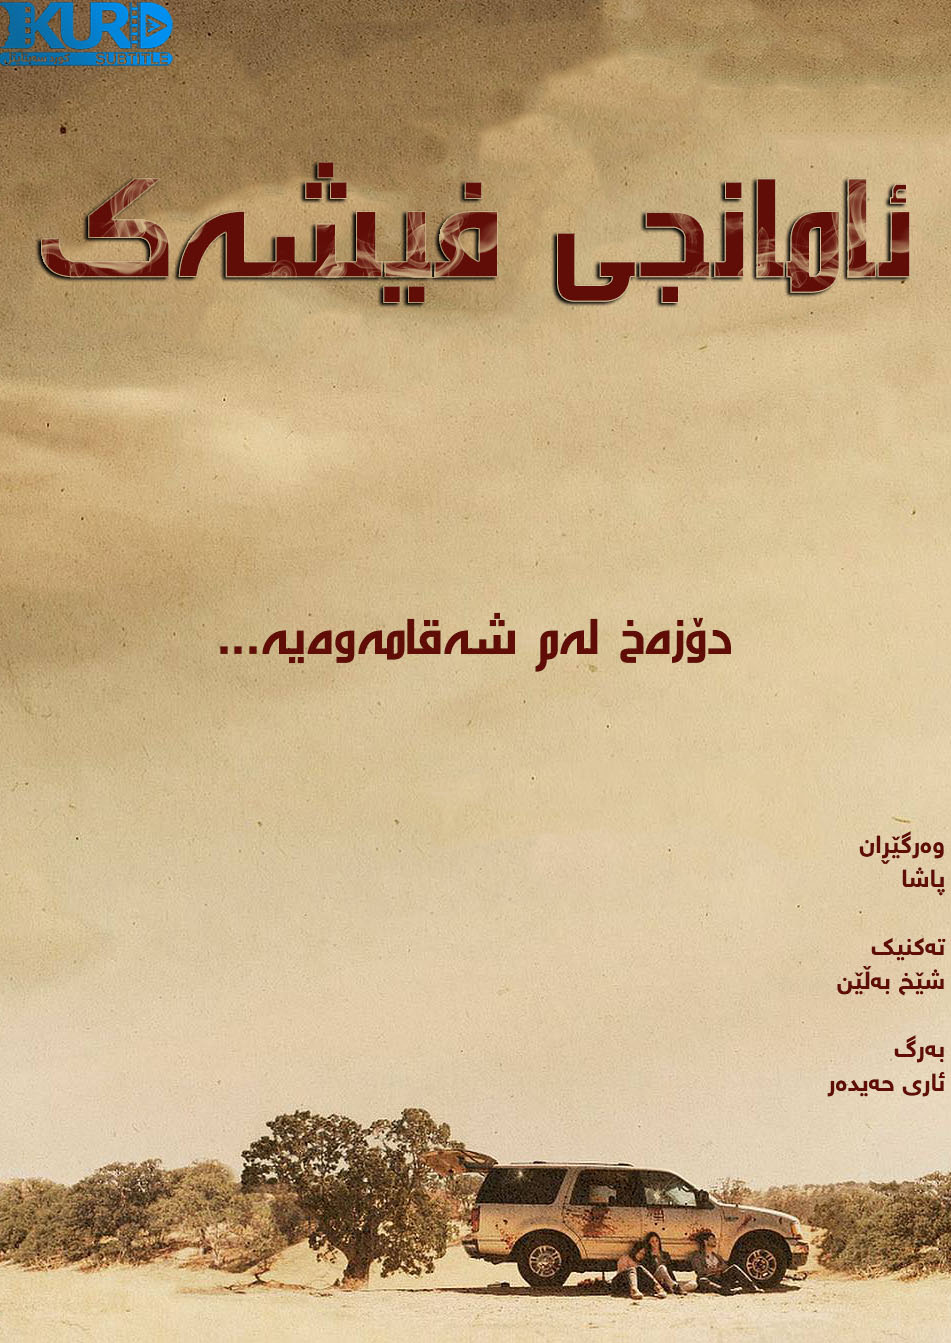 Downrange kurdish poster